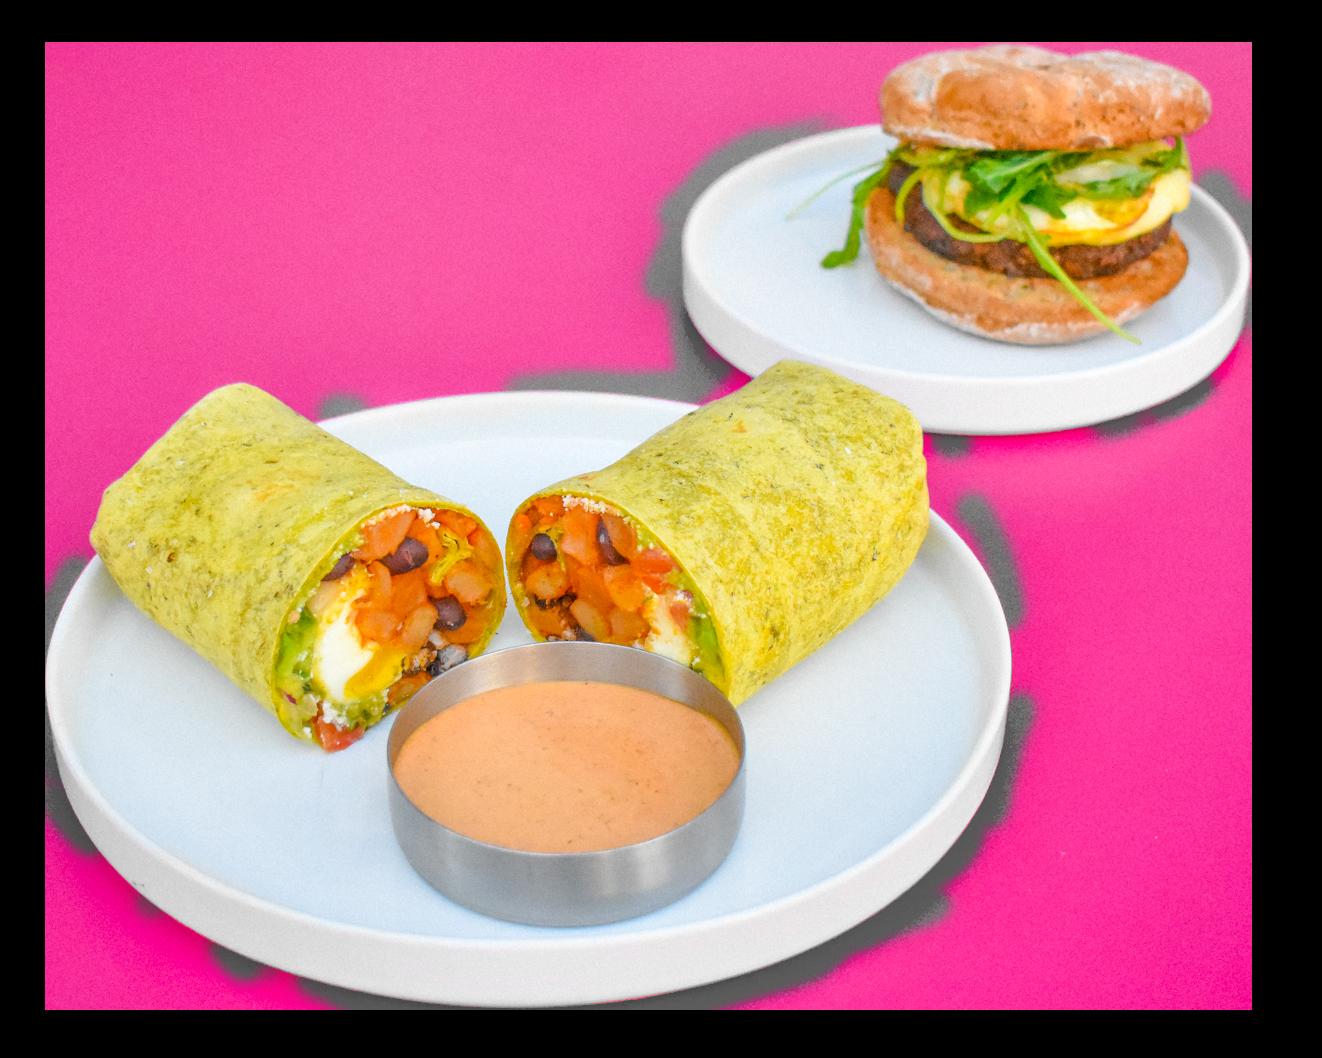 Corner Beet Cherry Creek Breakfast Lunch Coffee Salads Toast Avrum Elmakis Smoothies Vegan Vegetarian